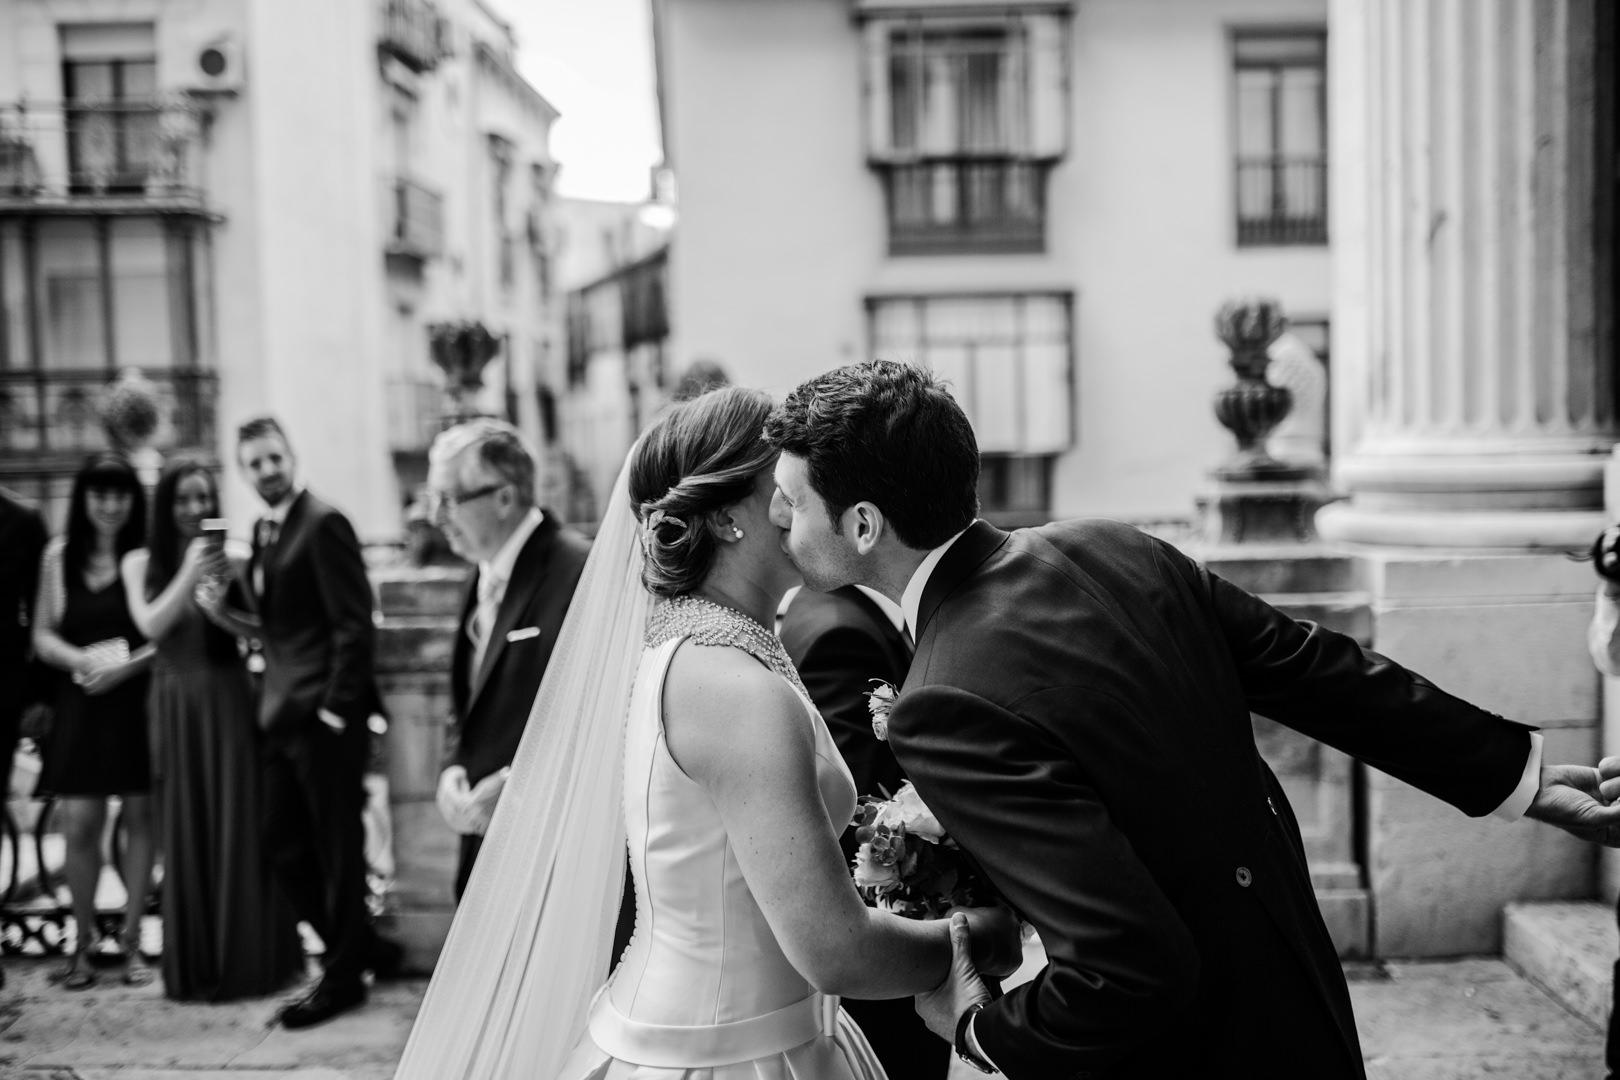 Boda-Catedral-Jaen-Hamburgo-Maria-David-engagement-Rafael-Torres-fotografo-bodas-sevilla-madrid-barcelona-wedding-photographer--20.jpg